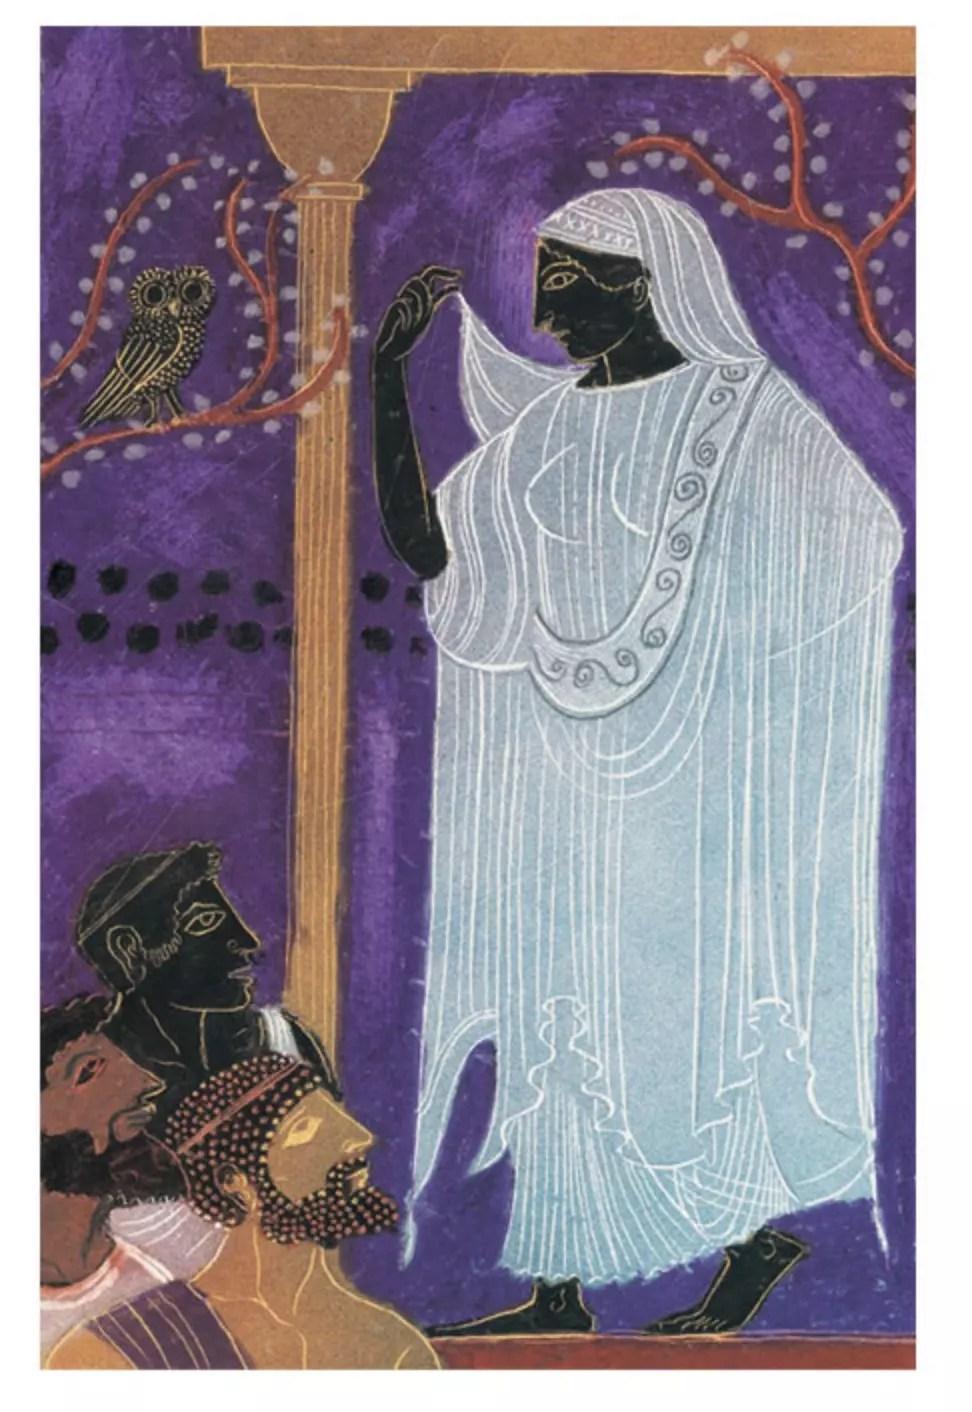 Illustration from FS Odyssey – beautifulbooks.info